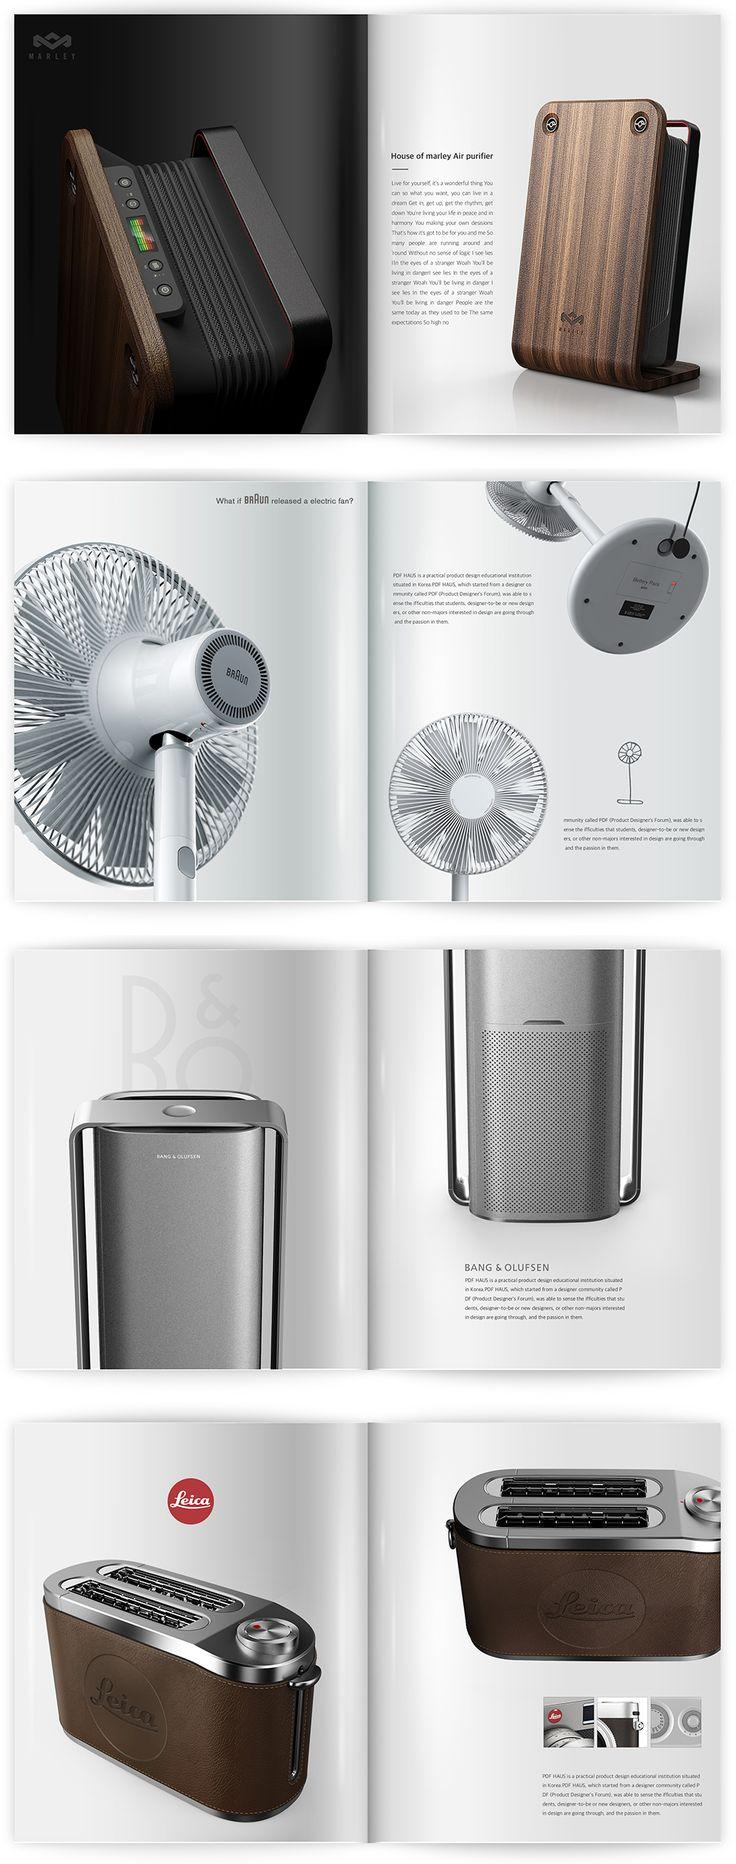 Product design / Industrial design / 제품디자인 / 산업디자인 /Industrial / book / Brochure / Banner /design /